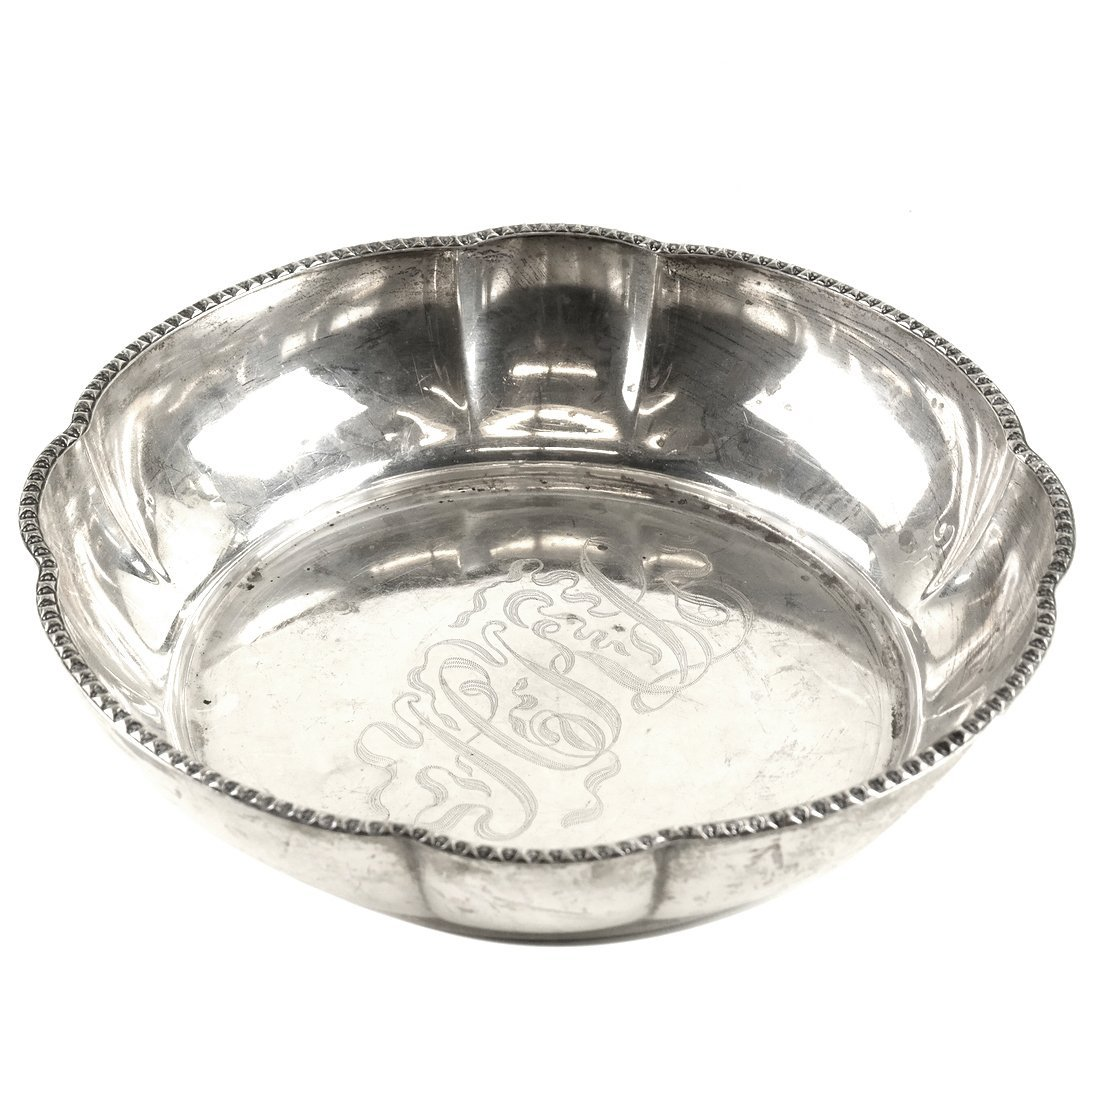 Gorham Silver Bowl - 2